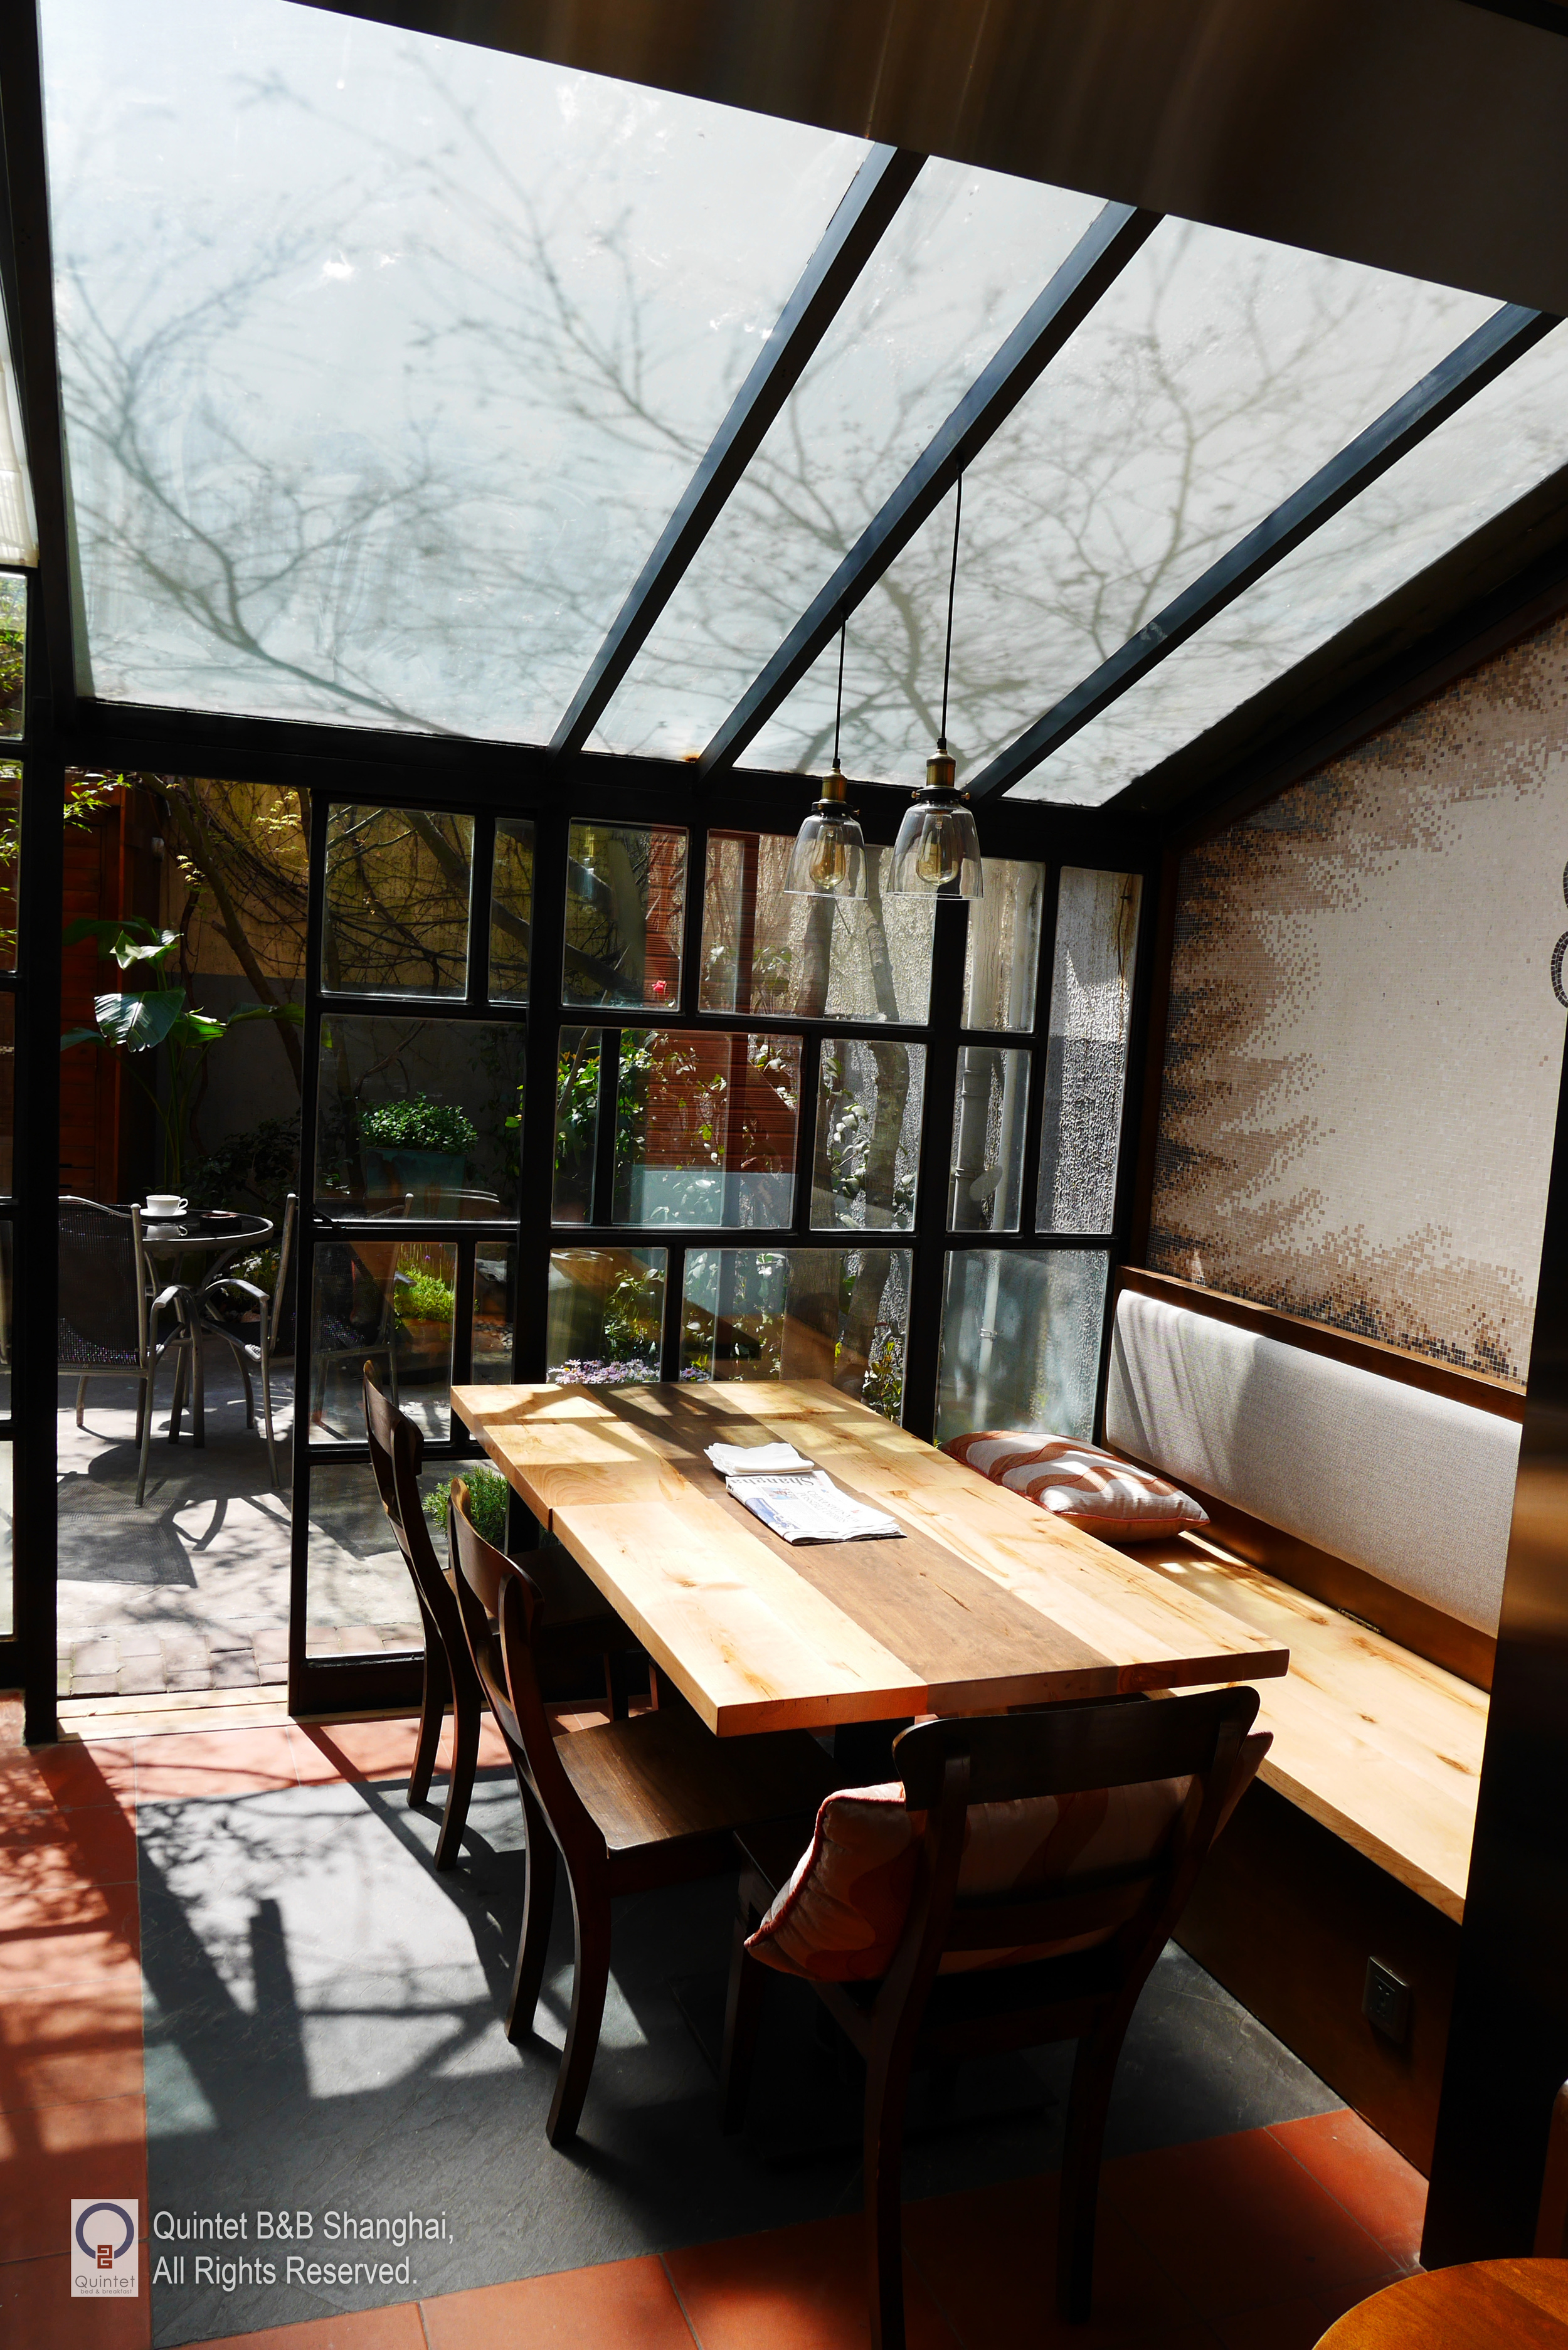 Shanghai Quintet bed and breakfast_Private Kitchen 808 (3).JPG